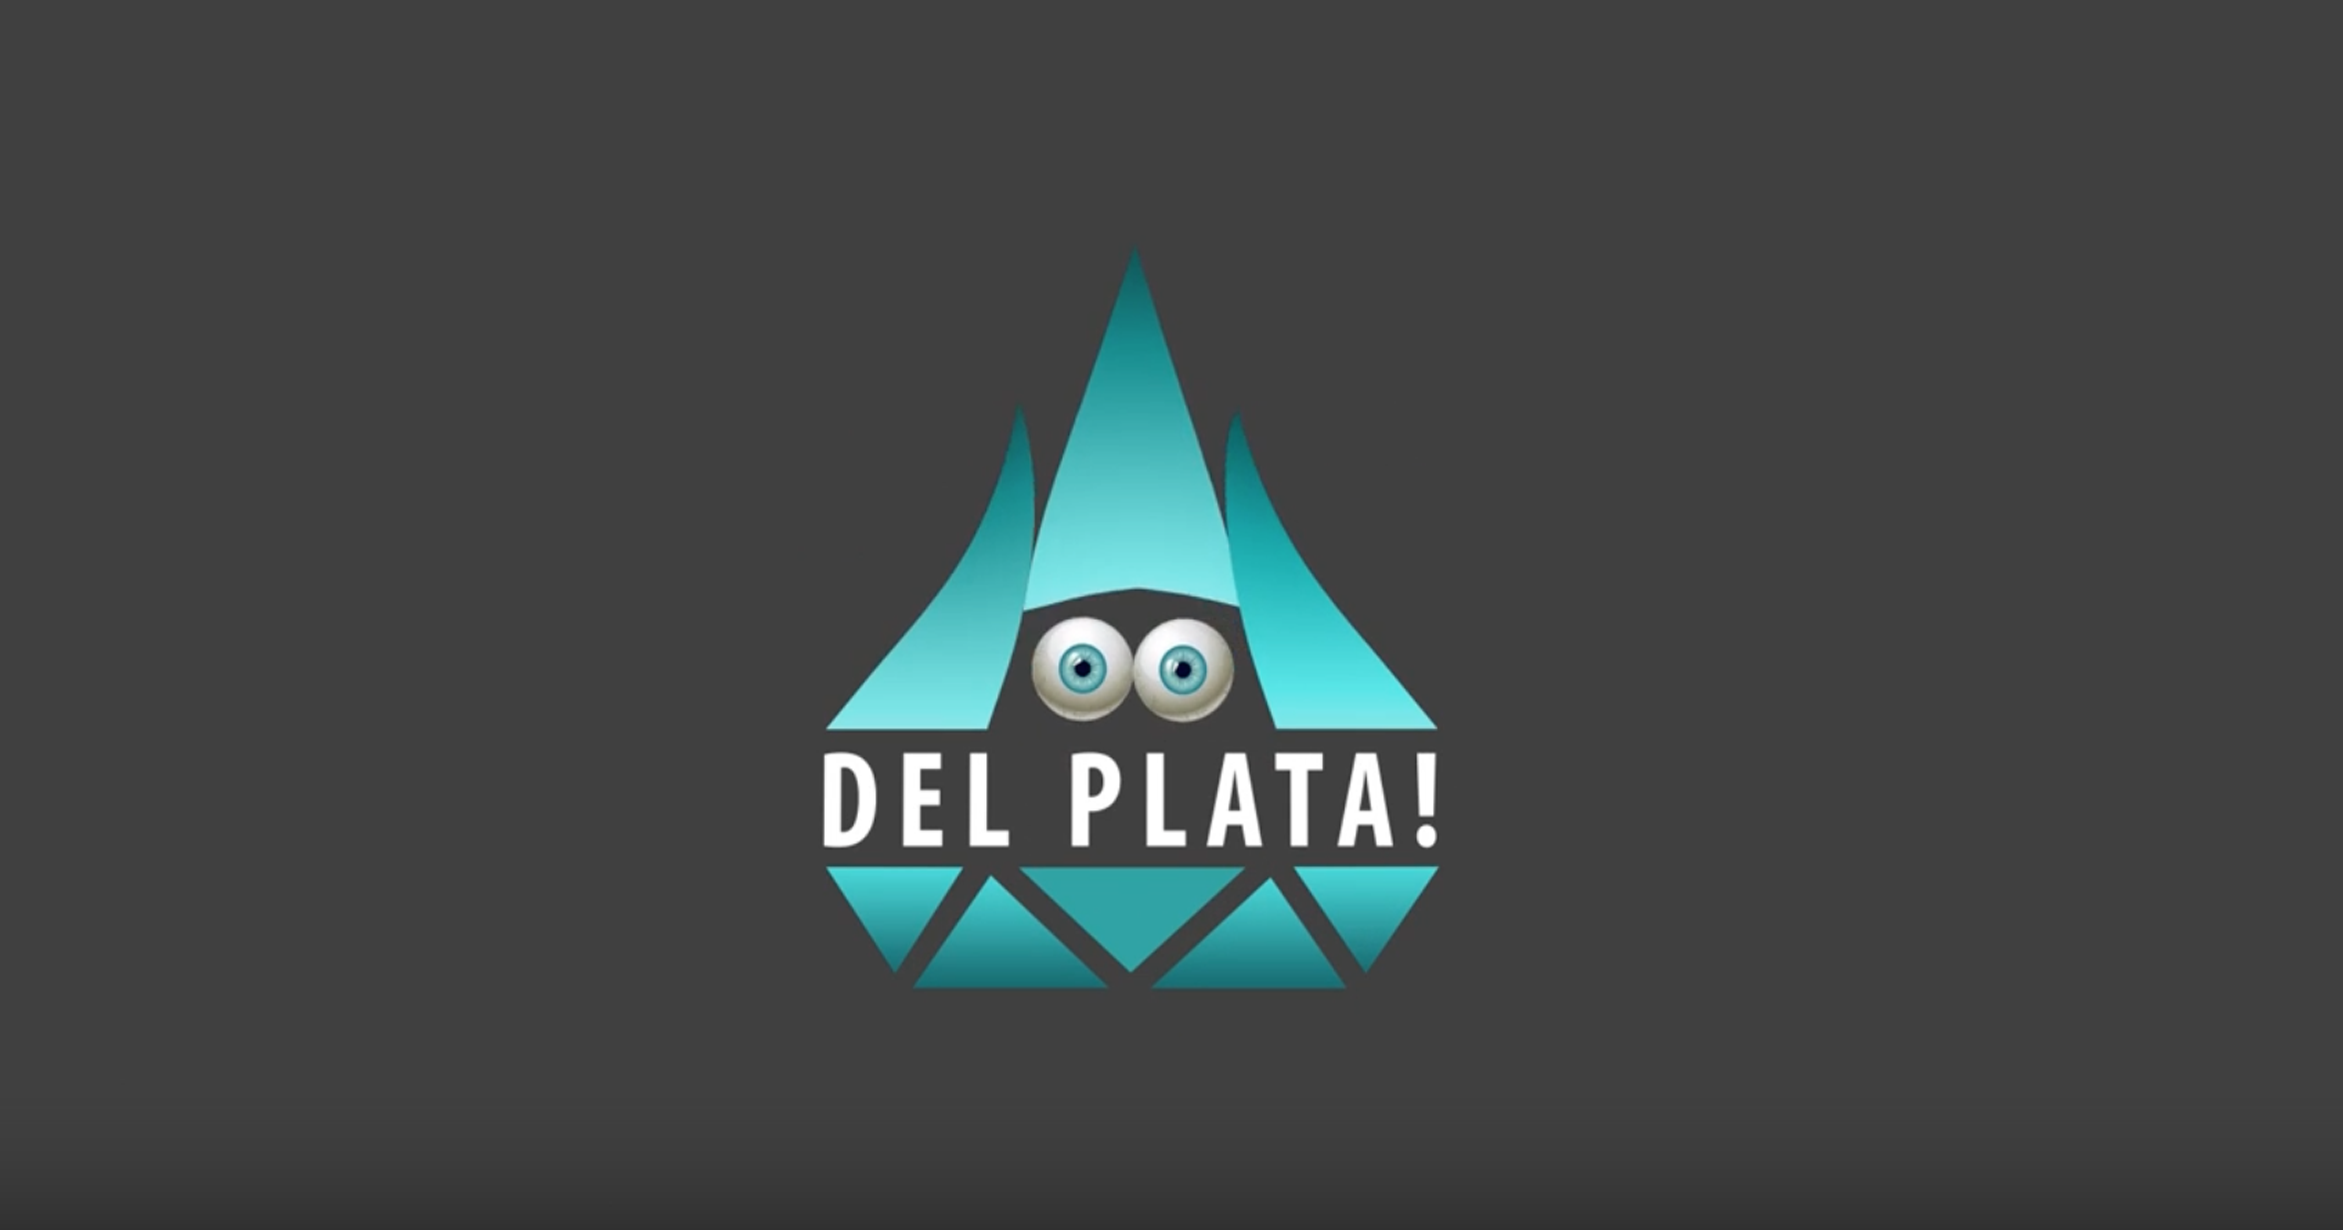 DEL PLATA!